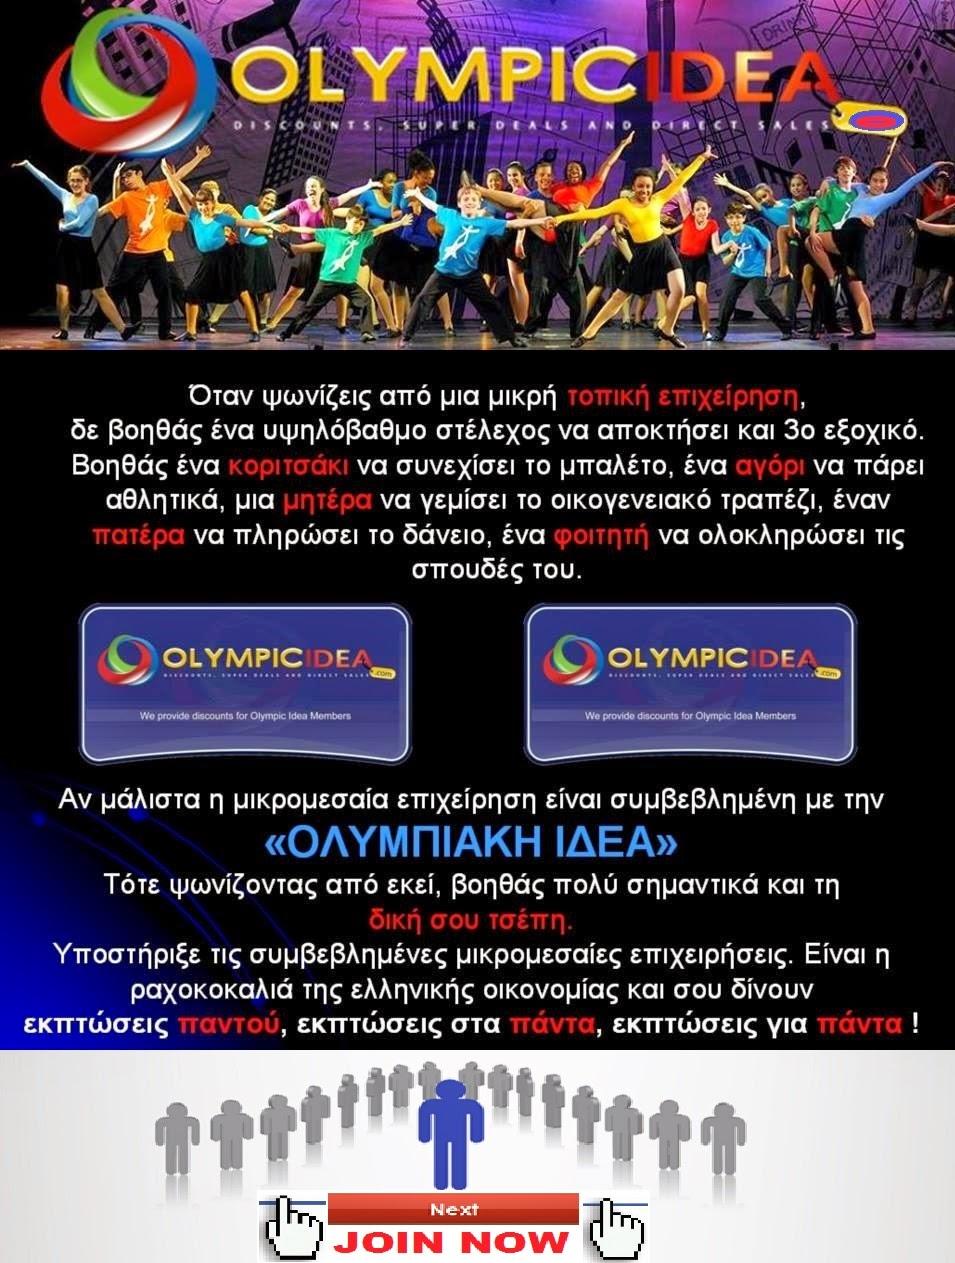 Olympic idea : Η δική σας online επιχείρηση